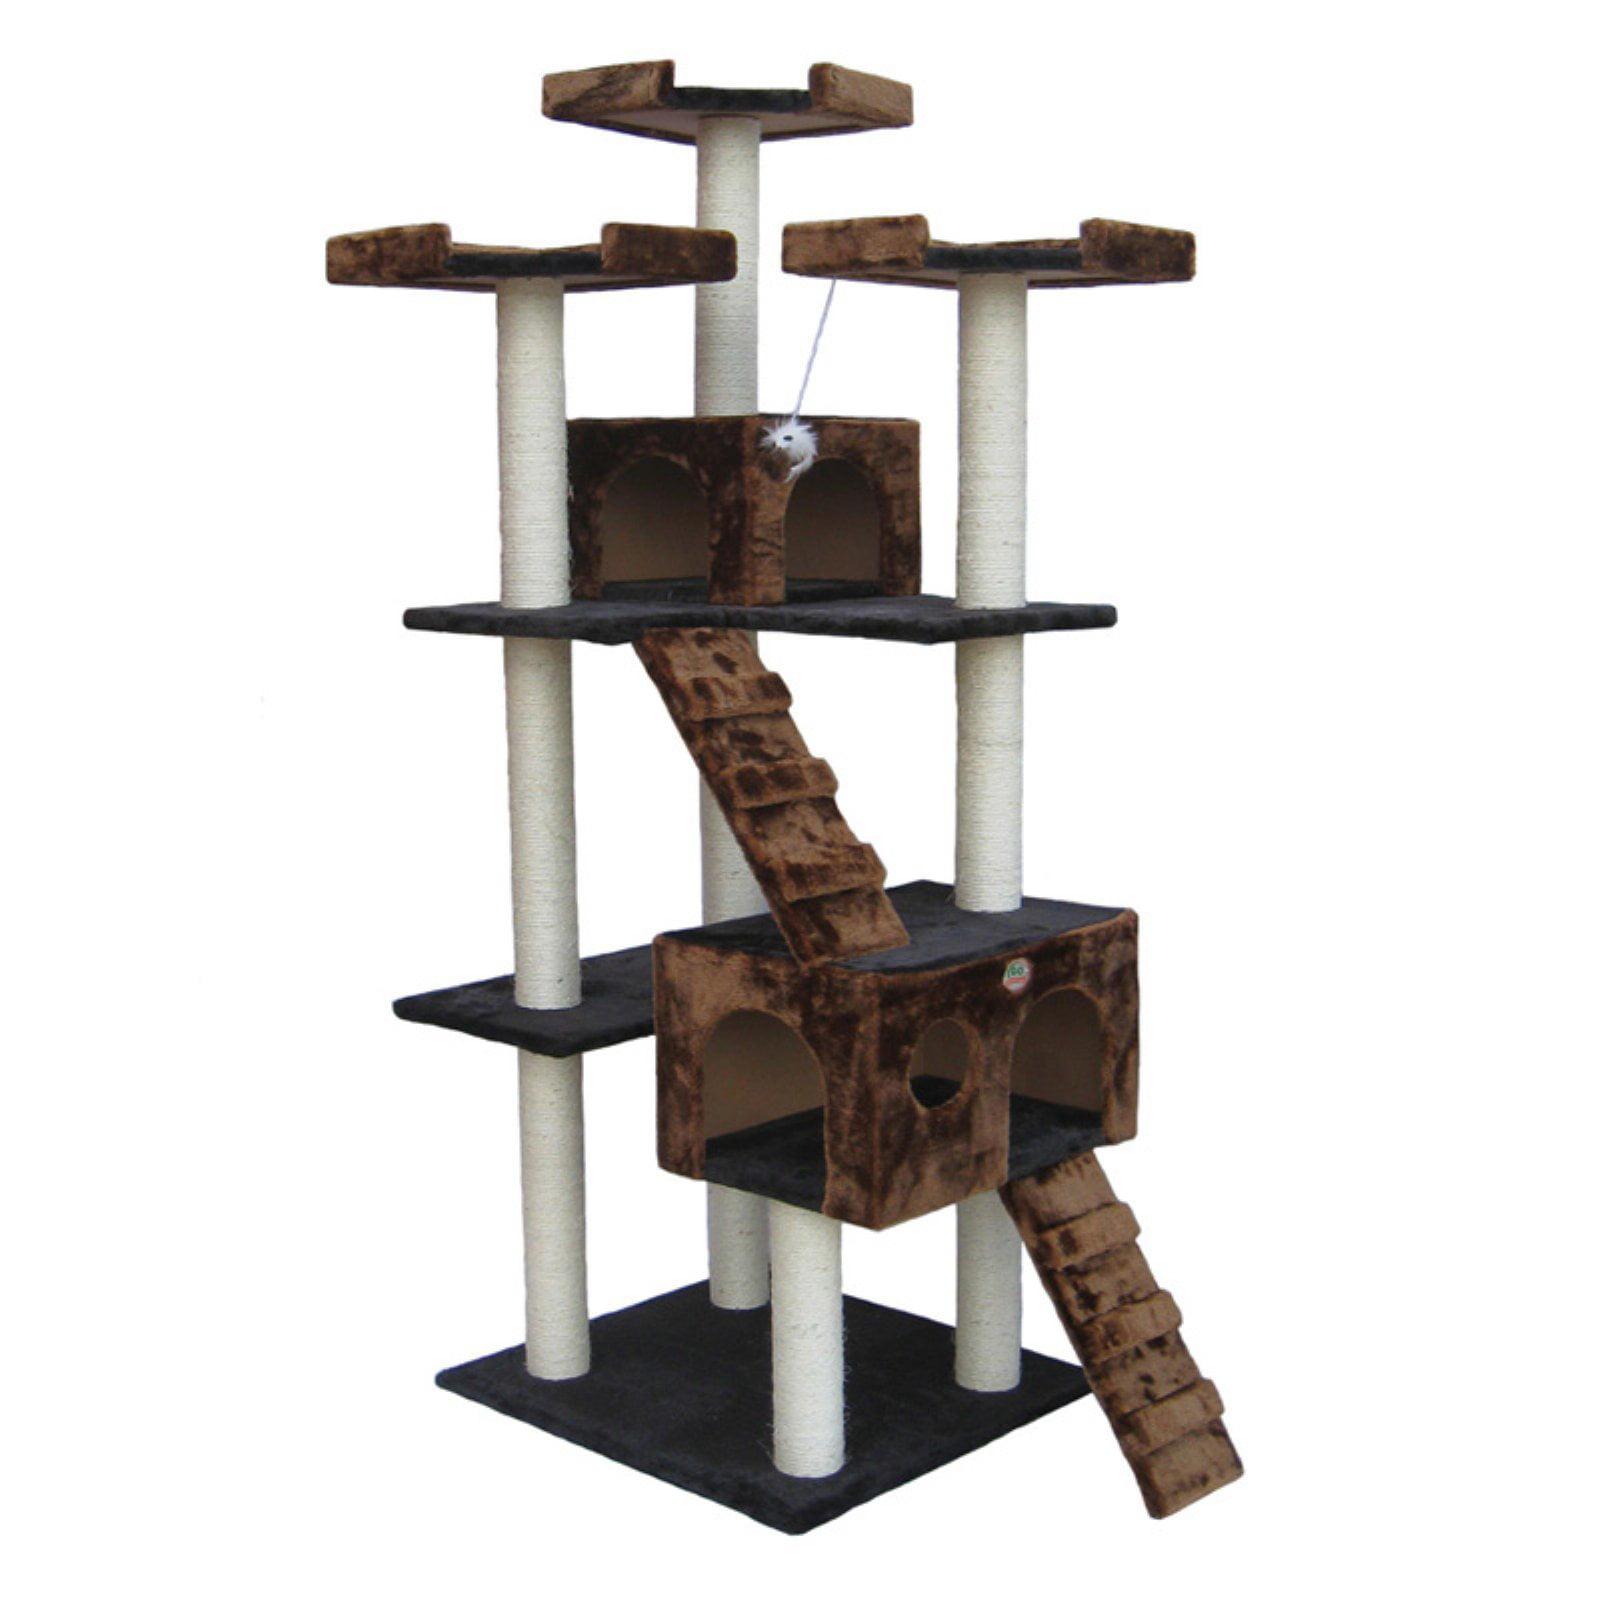 Go Pet Club Cat Tree Furniture 72 in. High Loft by Go Pet Club LLC